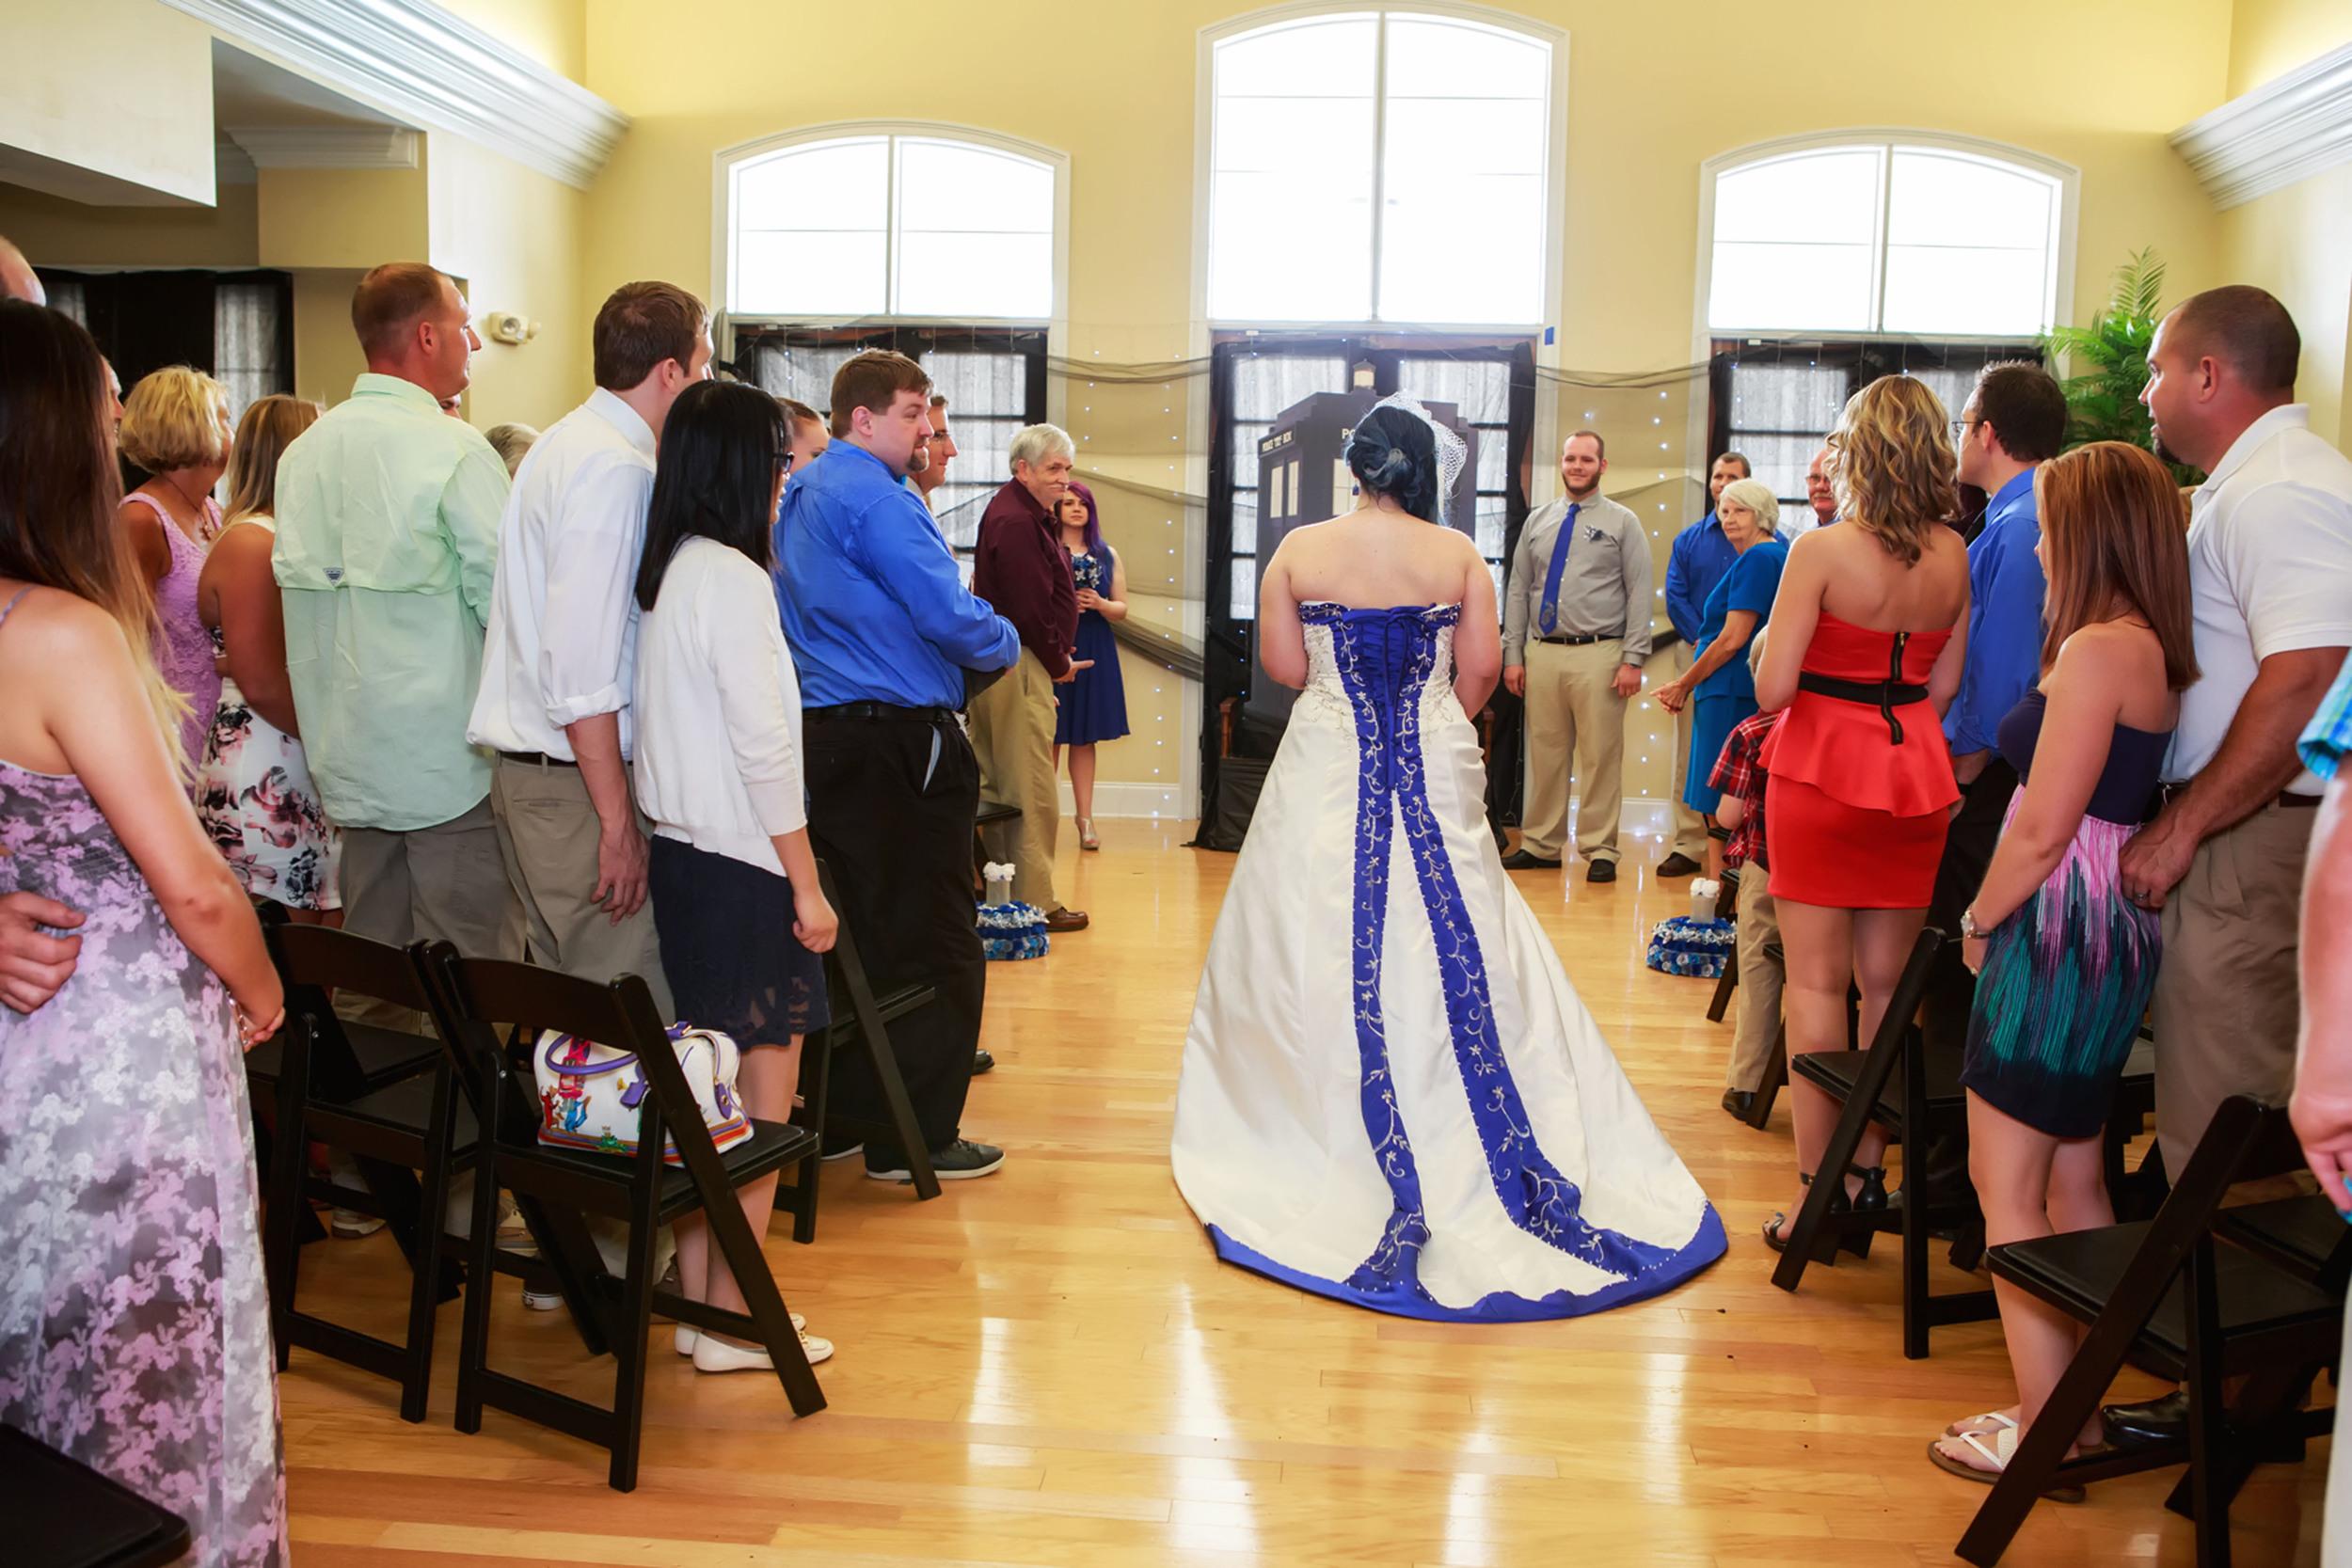 NC_Wedding_Photographer_Tiffany_Abruzzo_Ceremony_16.jpg